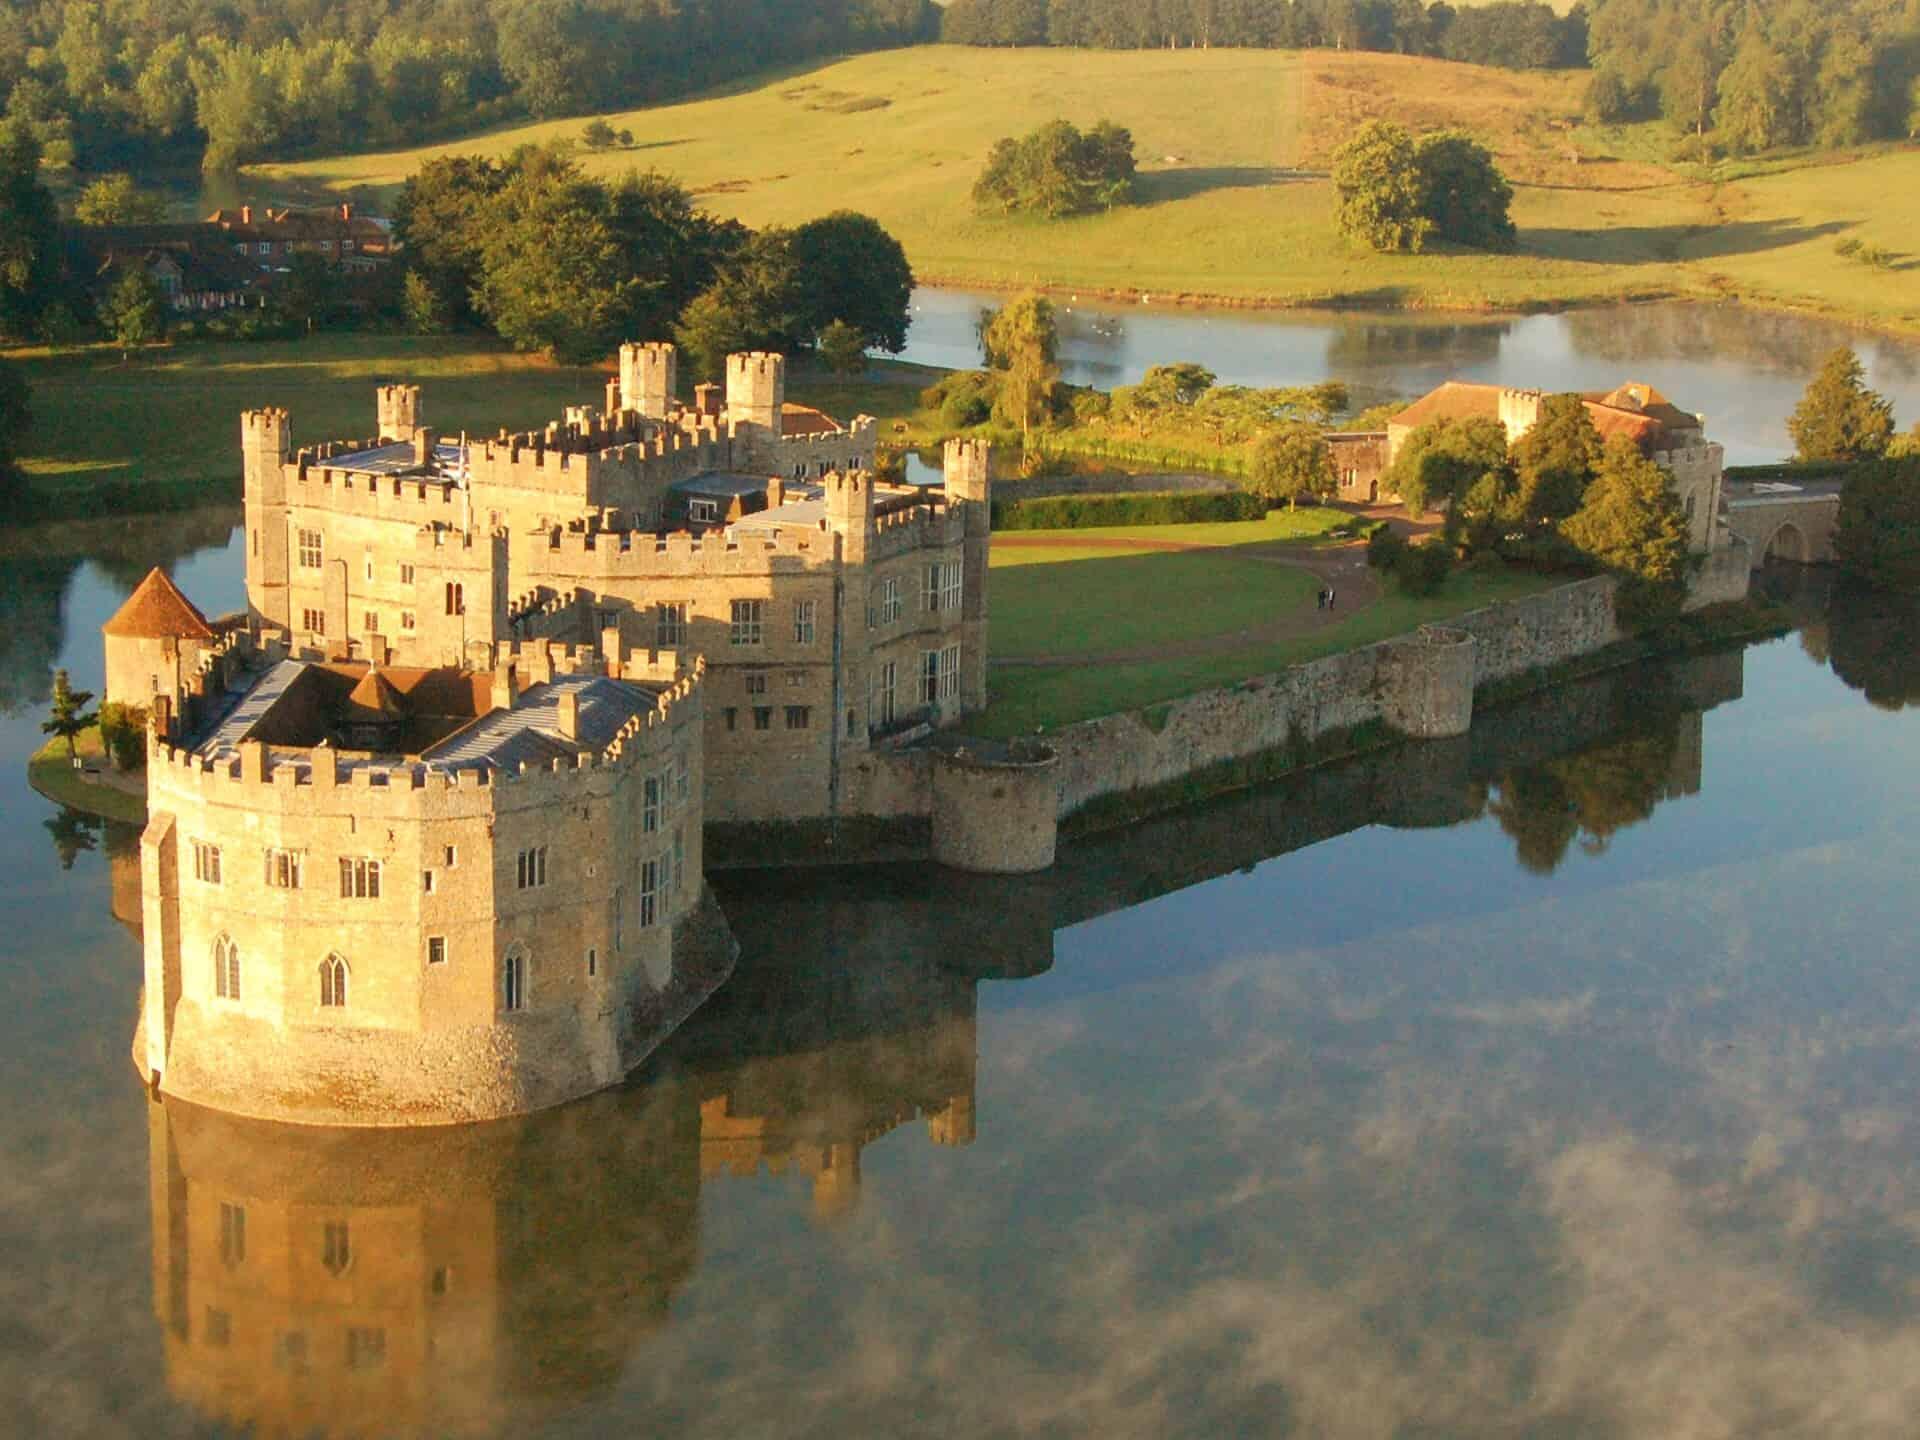 Leeds Castle - Best Castles To Visit in Europe